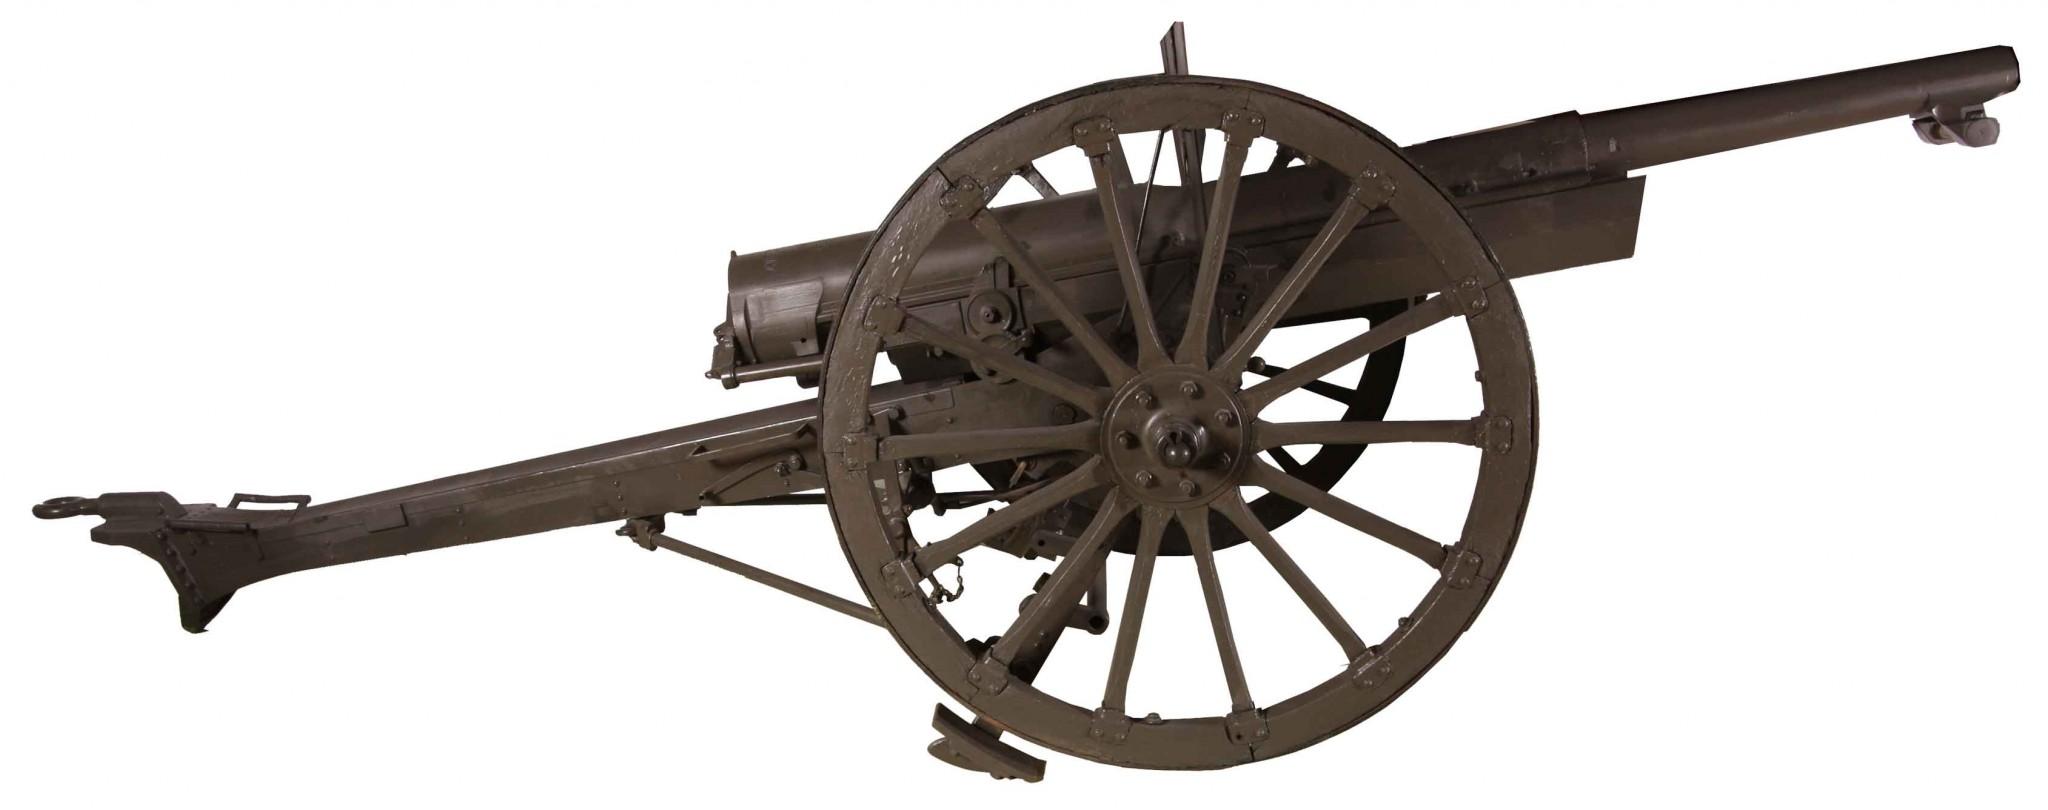 Armata polowa wz. 1897 kal. 75 mm (fot. www.muzeumwp.pl)